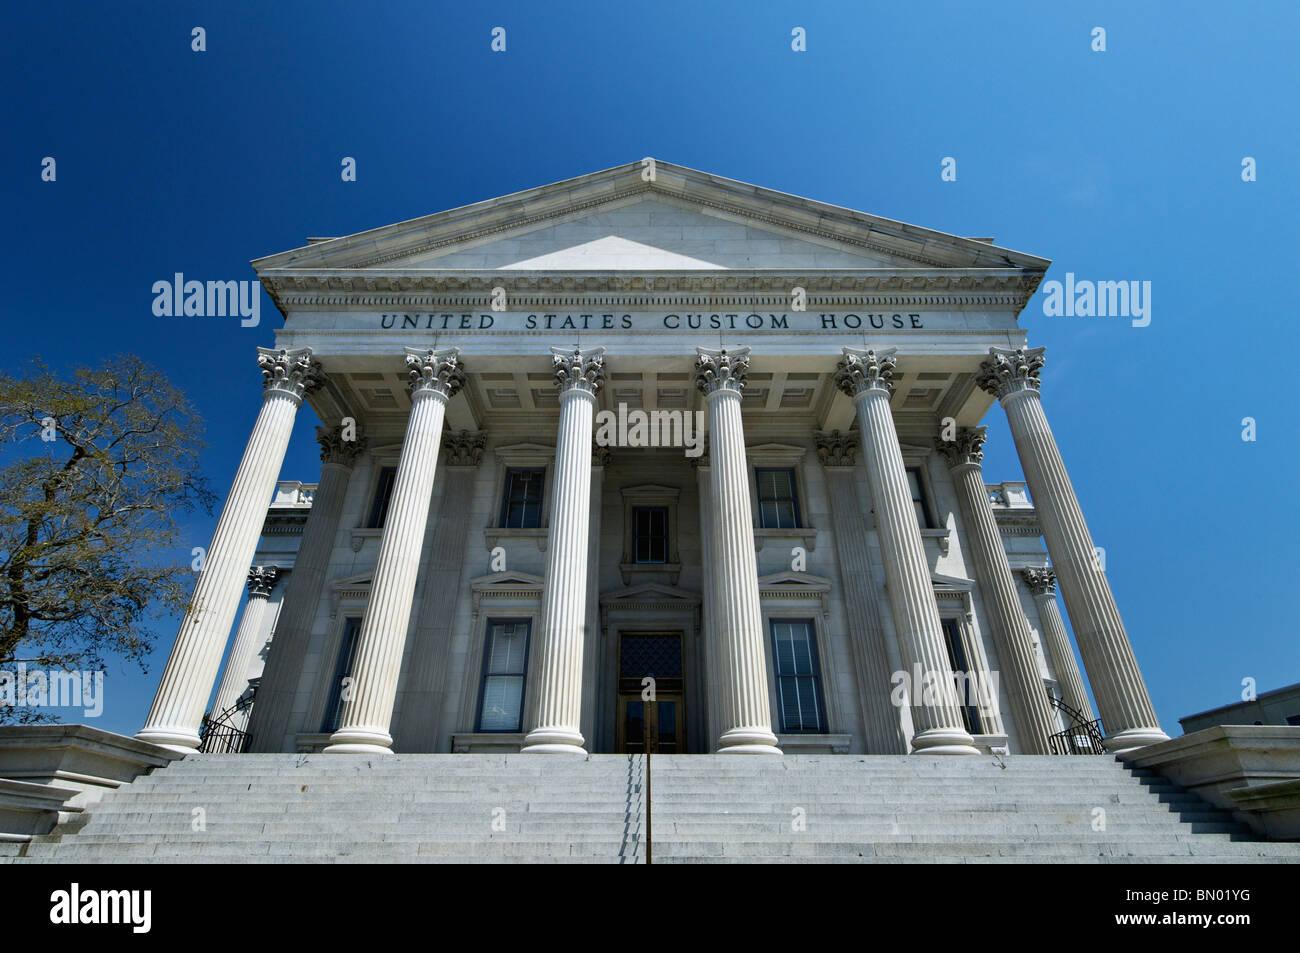 Vereinigten Staaten Zollhaus in Charleston, South Carolina Stockbild